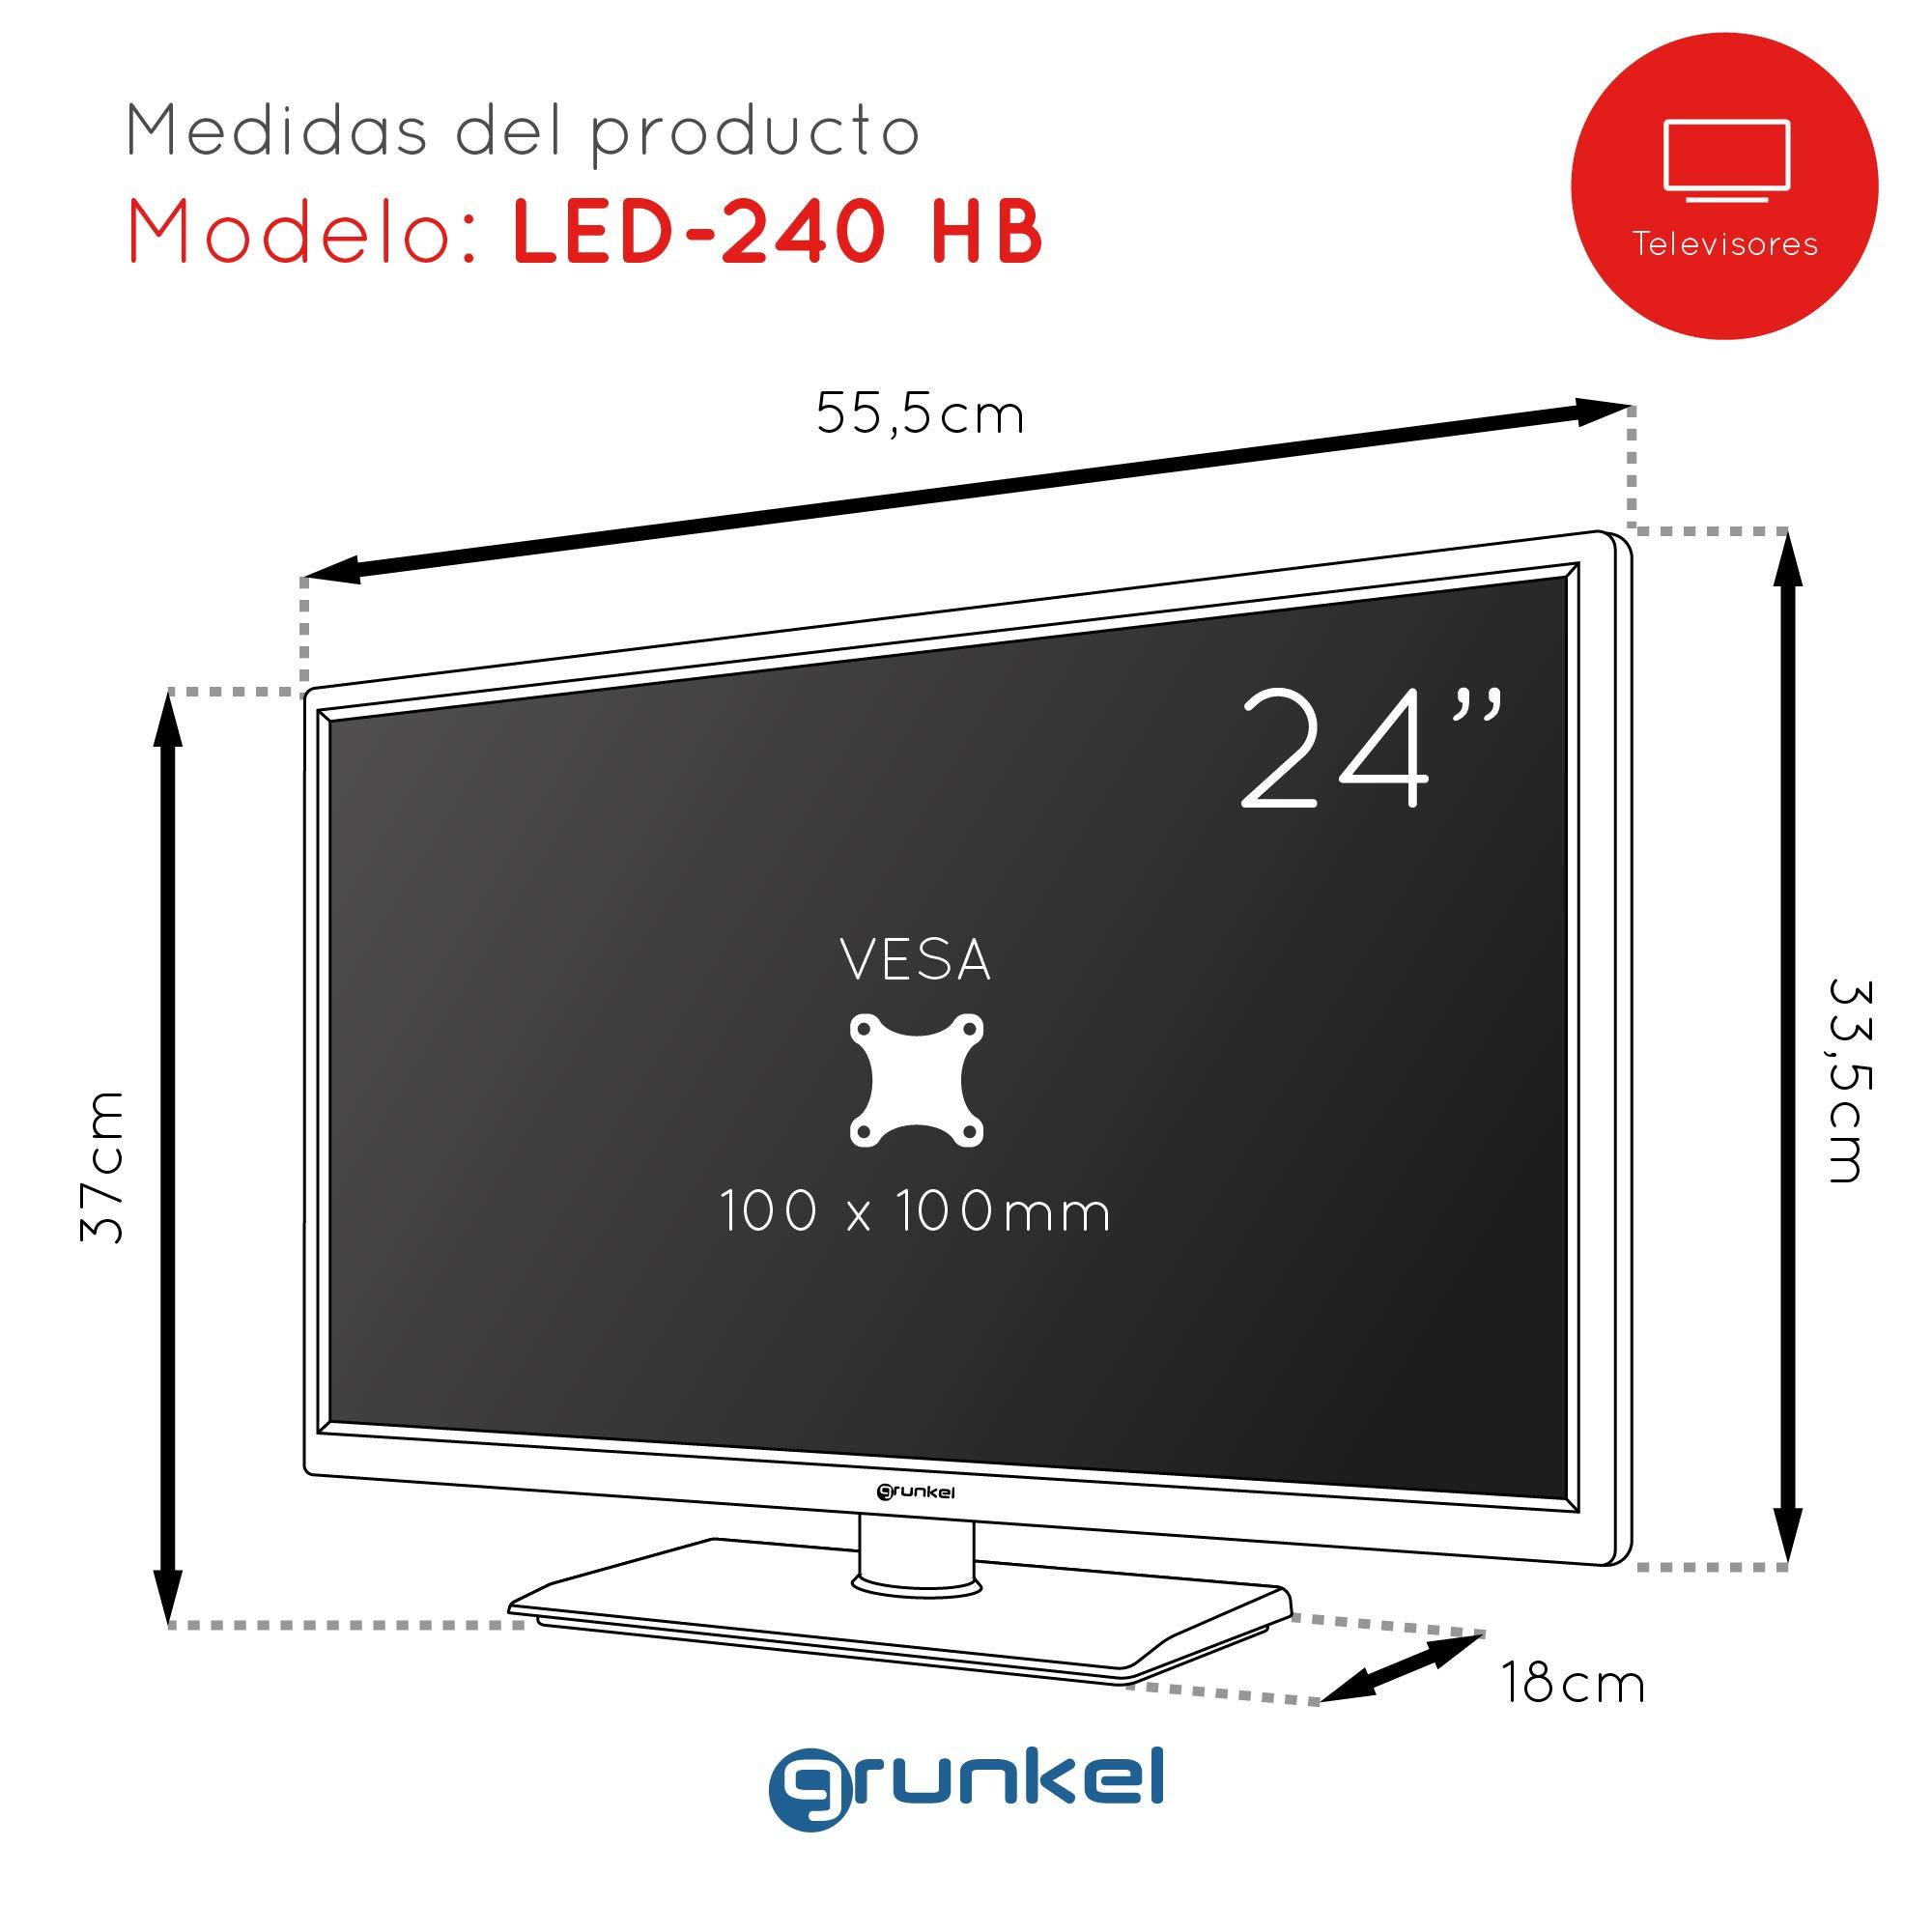 Grunkel - LED-240 HB - Televisor LED Full HD Alta definición - 24 ...